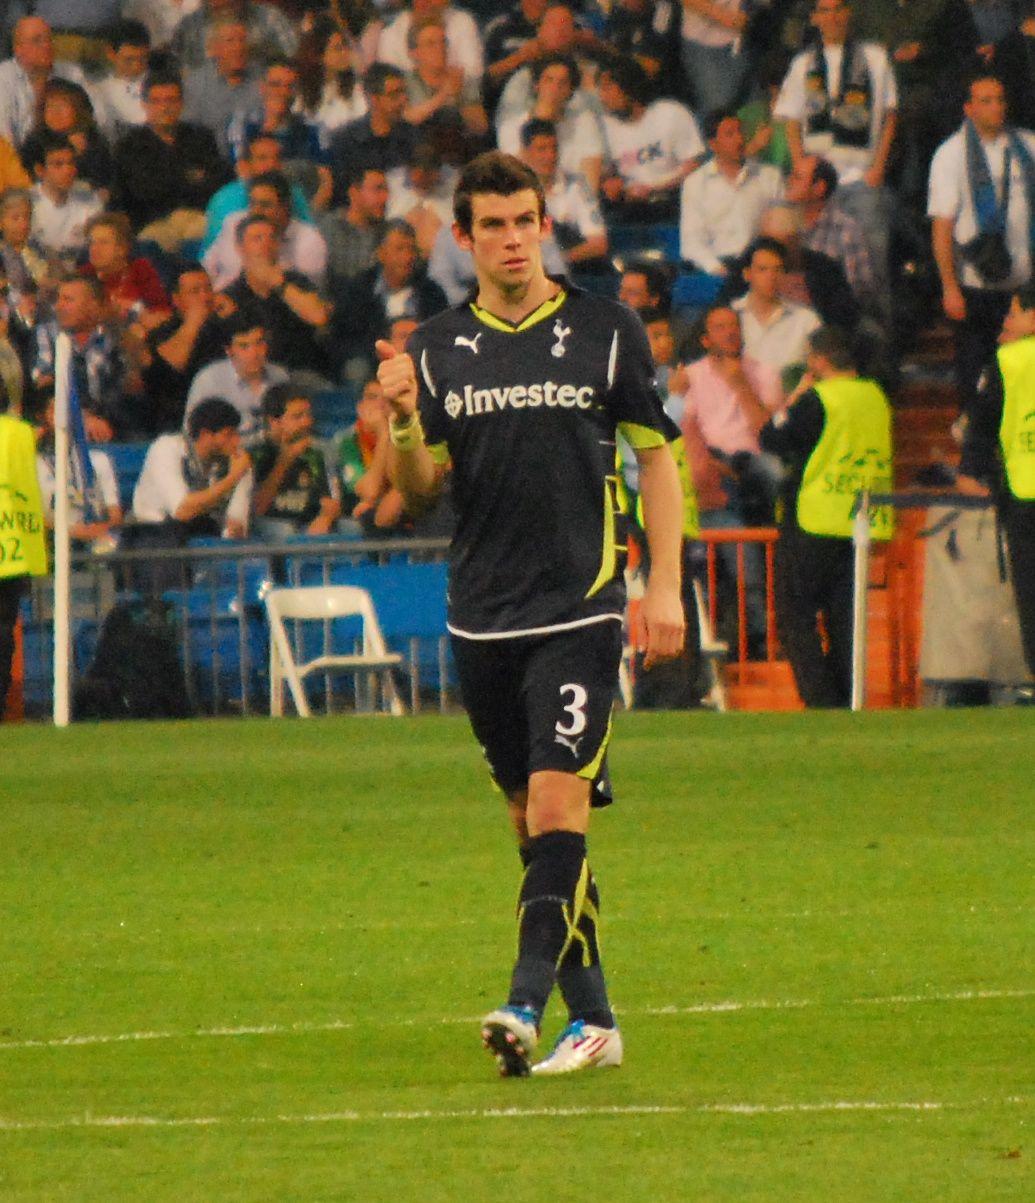 Tottenham Hotspur injury report Bale Injures Hamstring